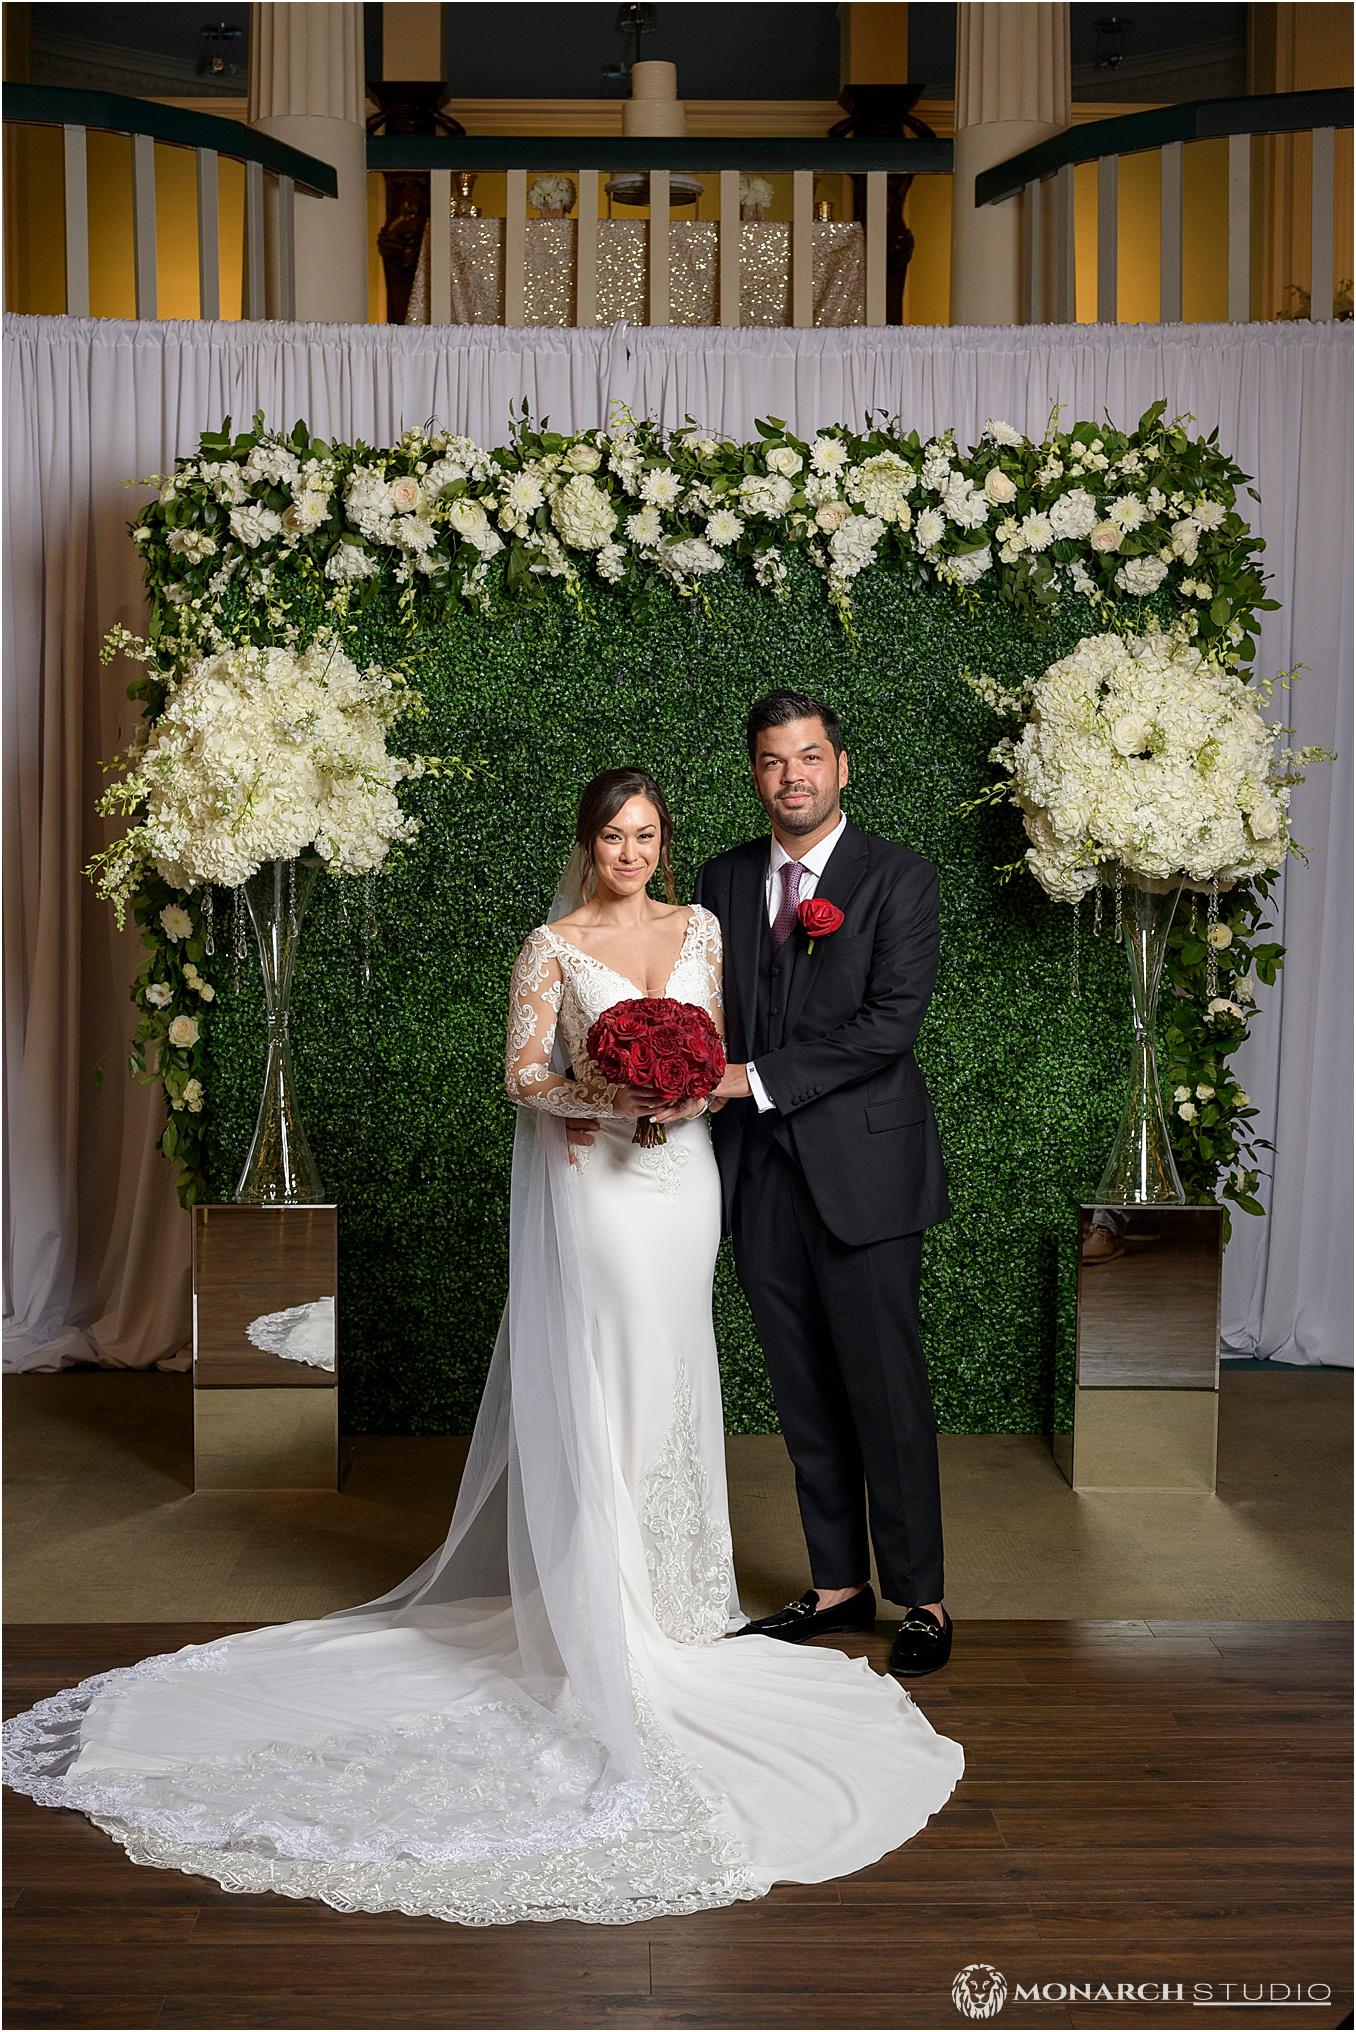 st-augustine-high-end-wedding-photographers-069.jpg